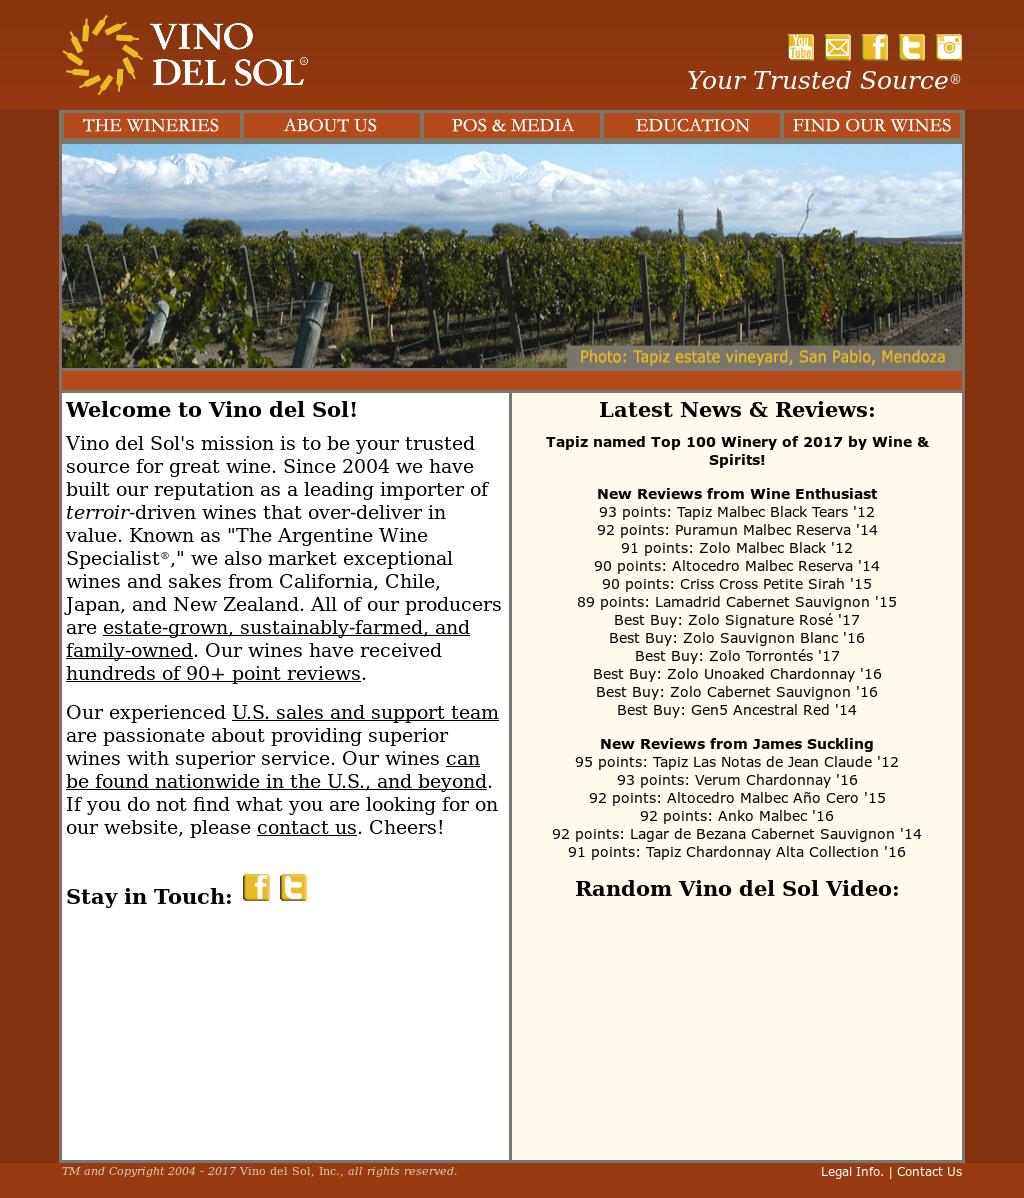 Vino Del Sol Competitors, Revenue and Employees - Owler